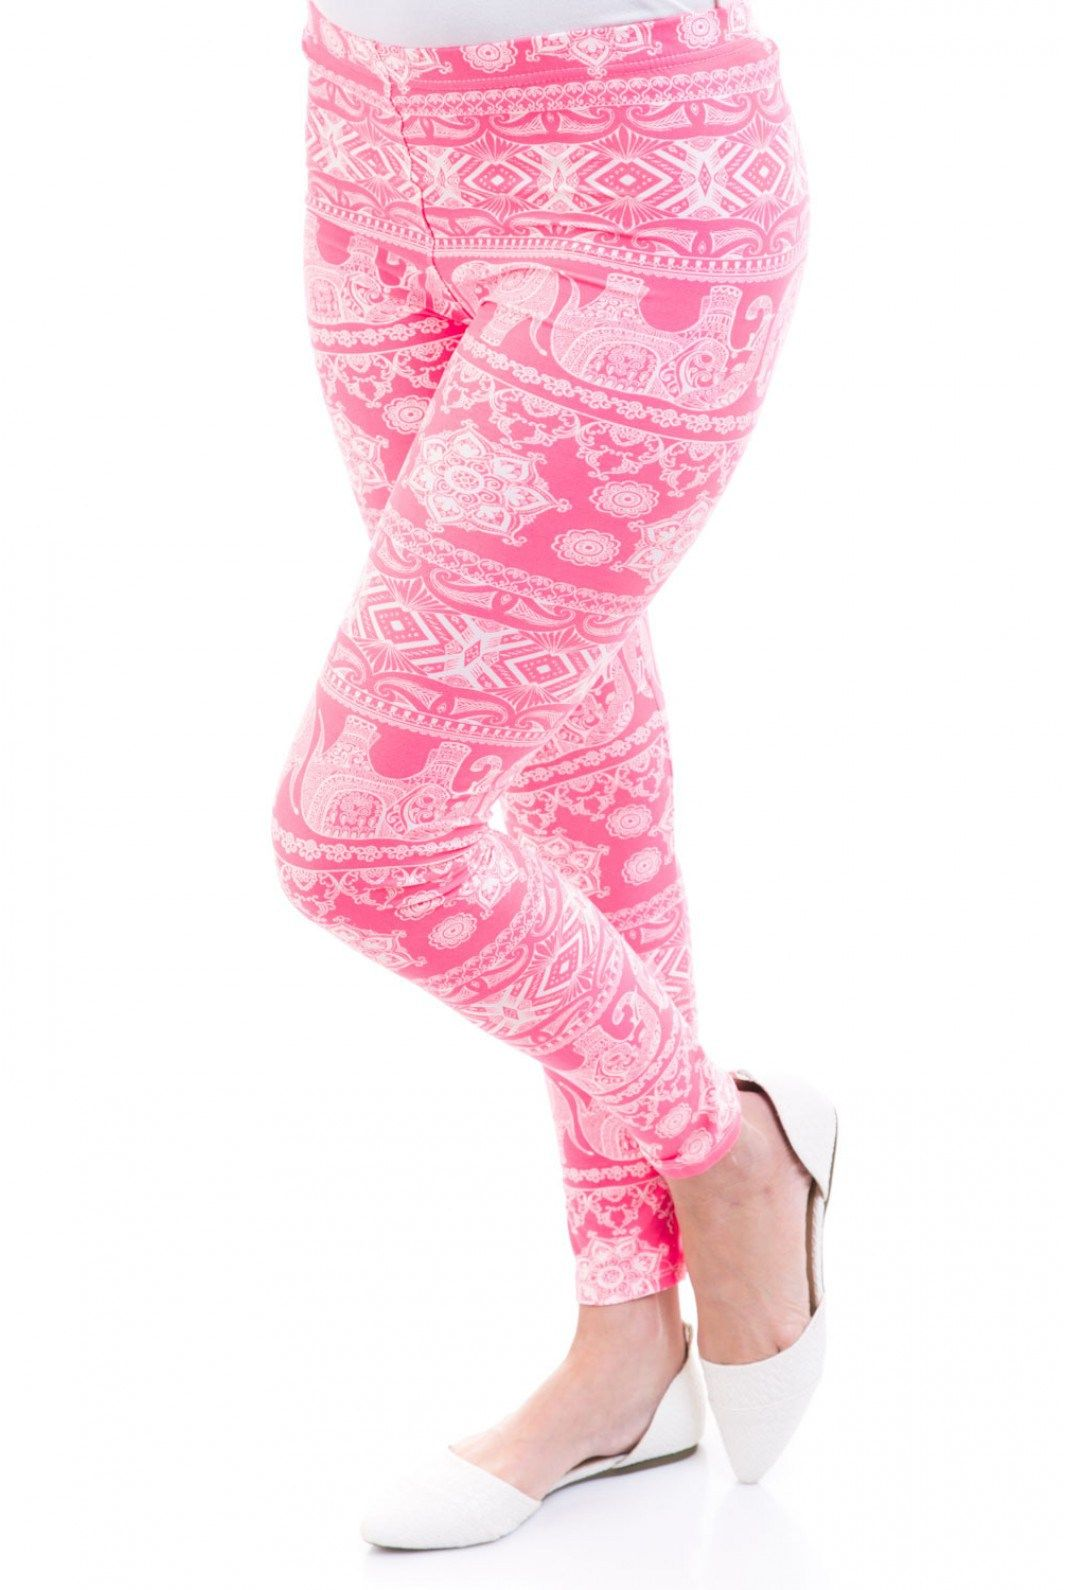 Type 1 Baby Elephant Walk Leggings In Pink - New Arrivals